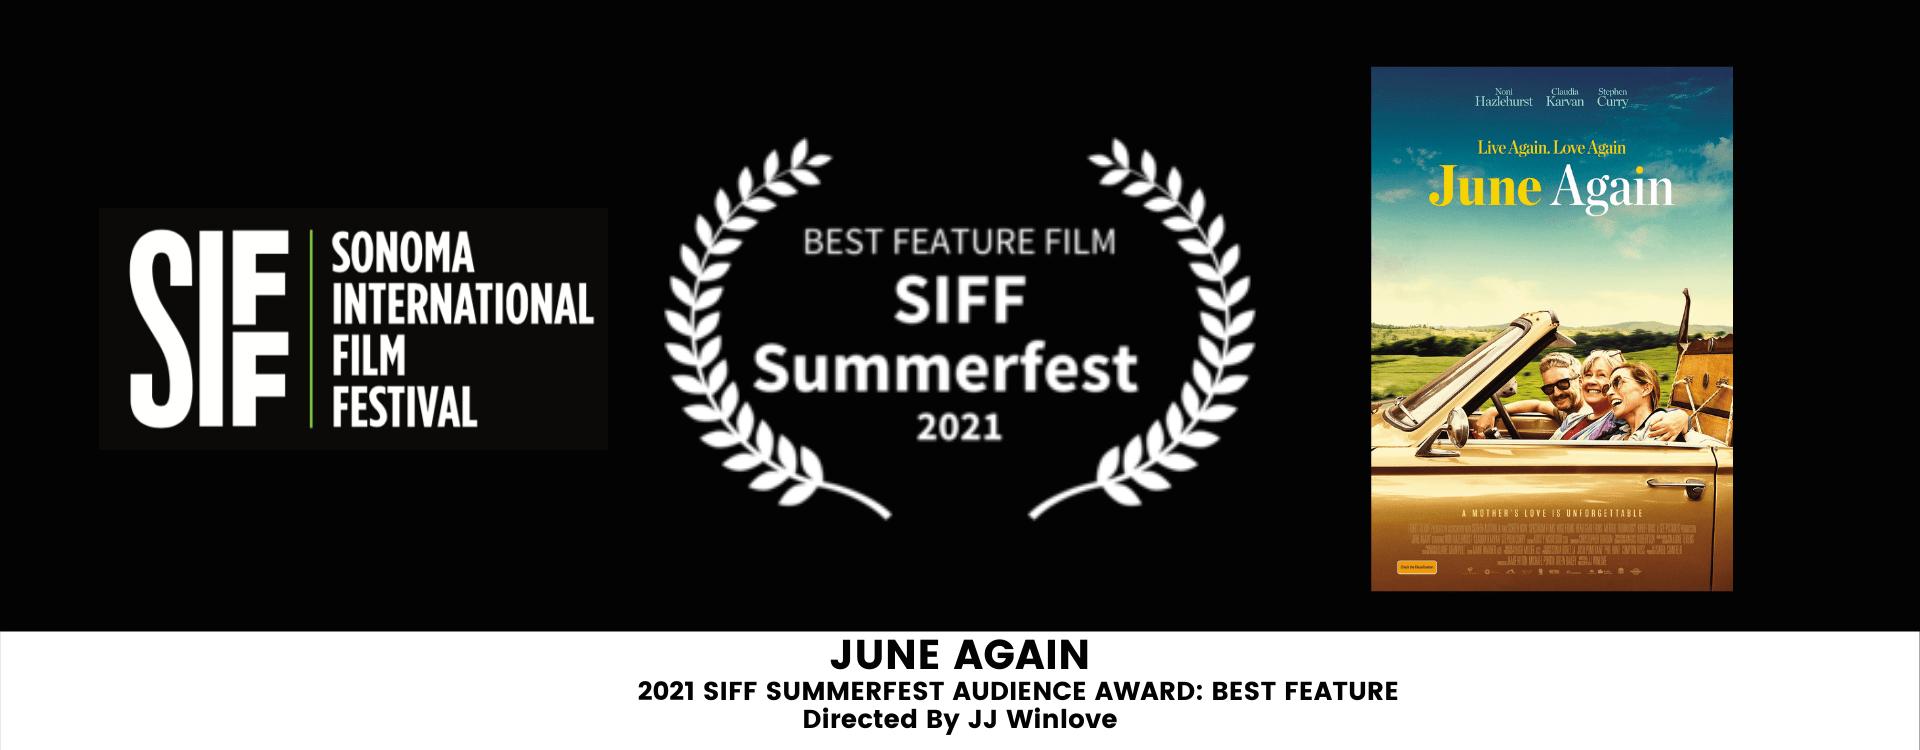 Best Feature Film SIFF Summerfest 2021